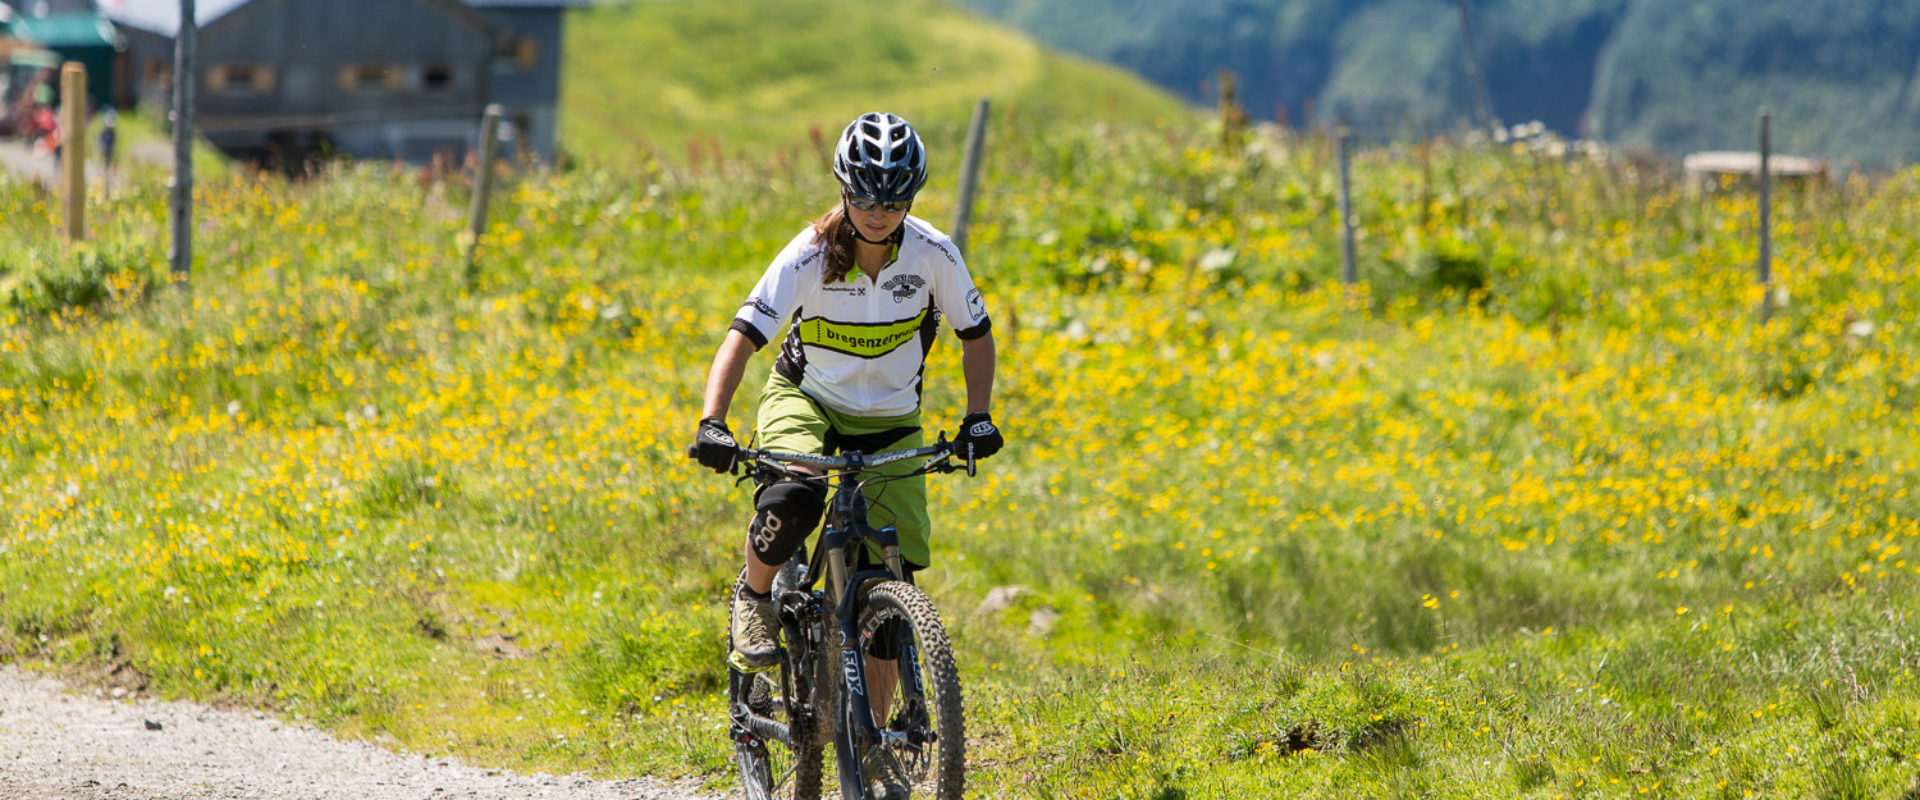 Mountainbike © Stephan Schatz / Die Bike-Schule Au-Schoppernau